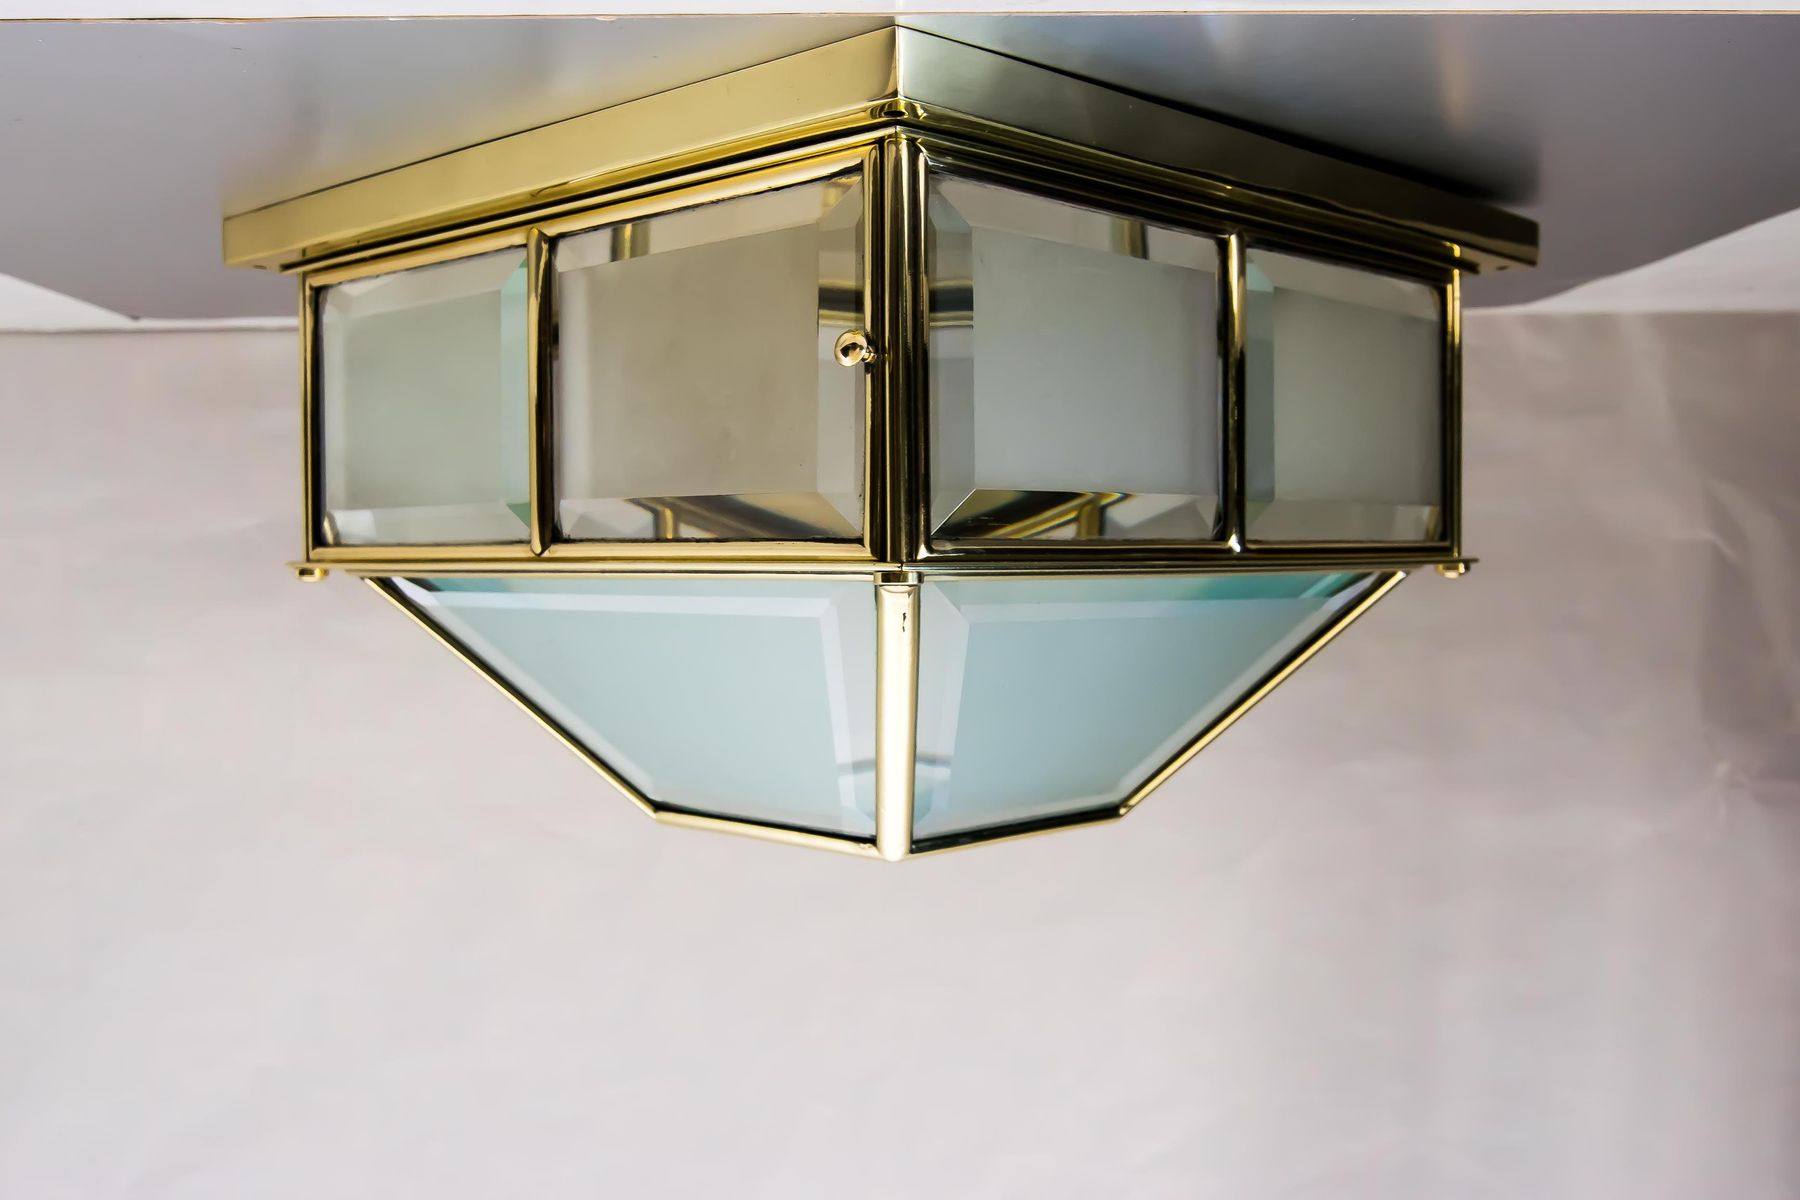 Jugendstil Deckenlampe antike jugendstil deckenlampe bei pamono kaufen